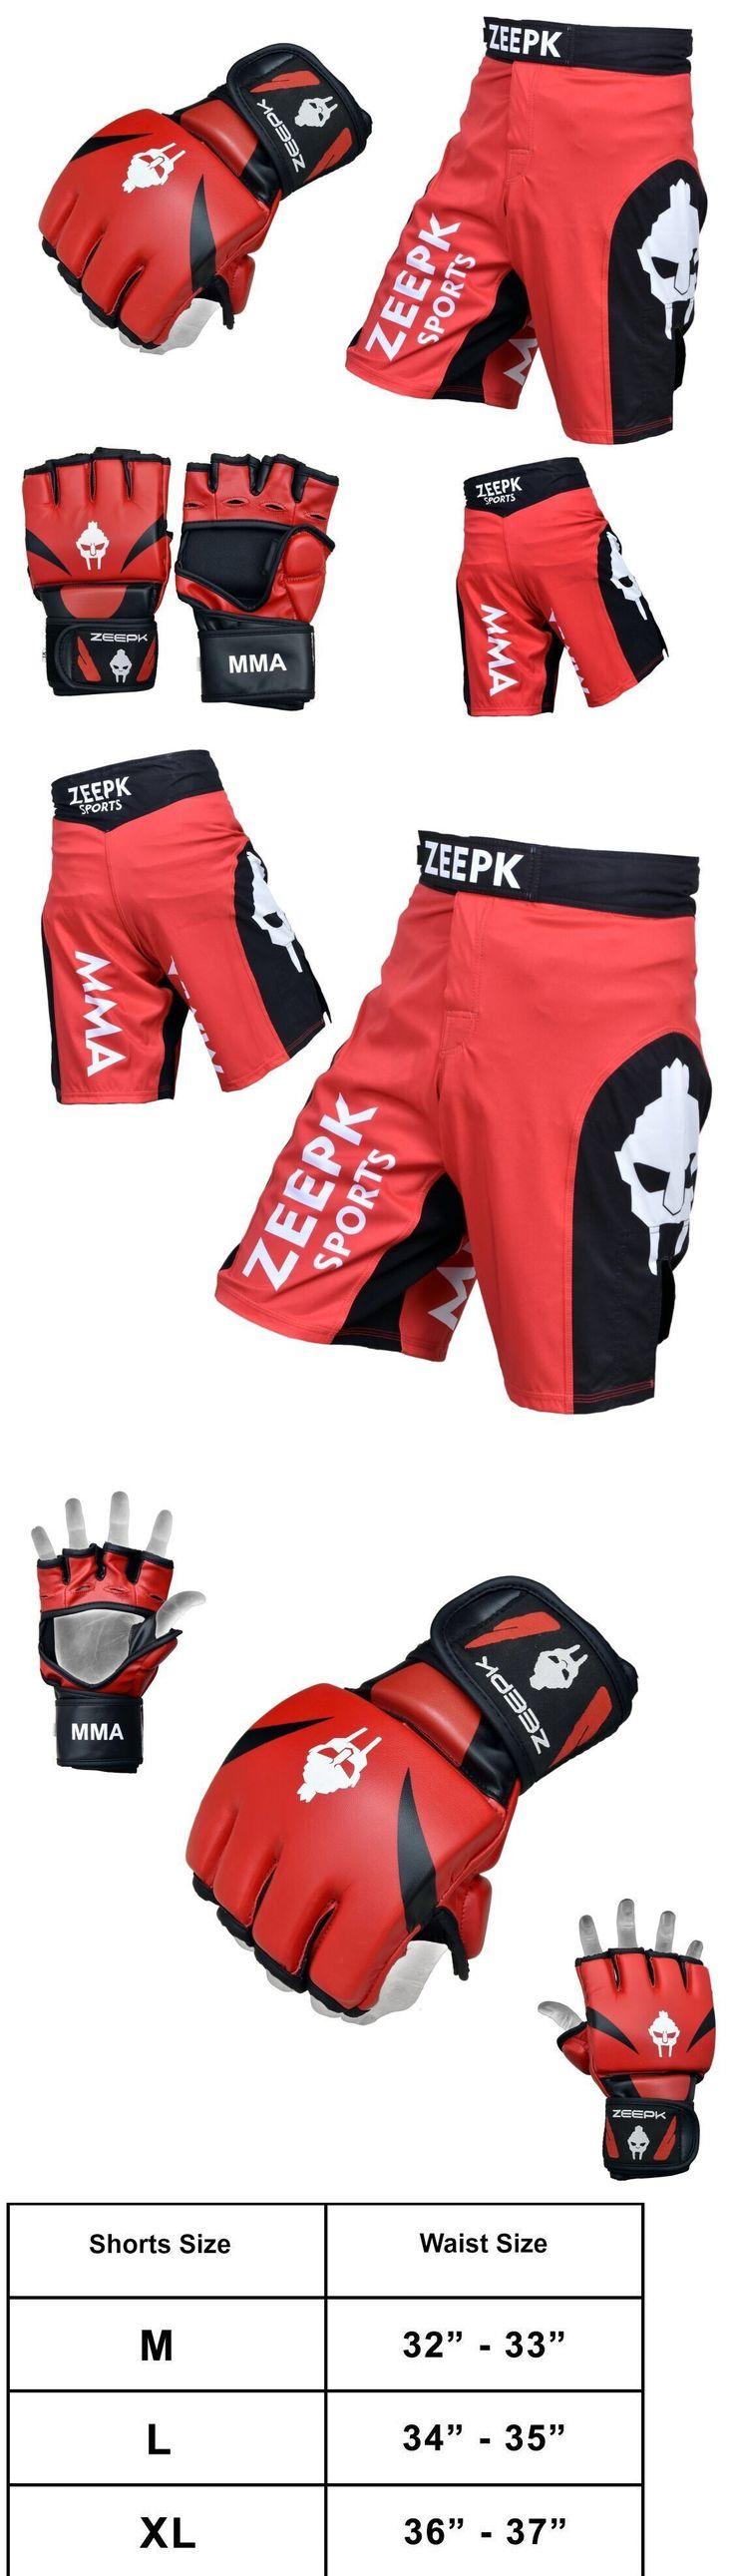 Shorts 73982: Ufc Fight Kit Mma Cage Grappling Kickboxing Veno Fight Gear Set Red Black Zeepk -> BUY IT NOW ONLY: $49.99 on eBay!